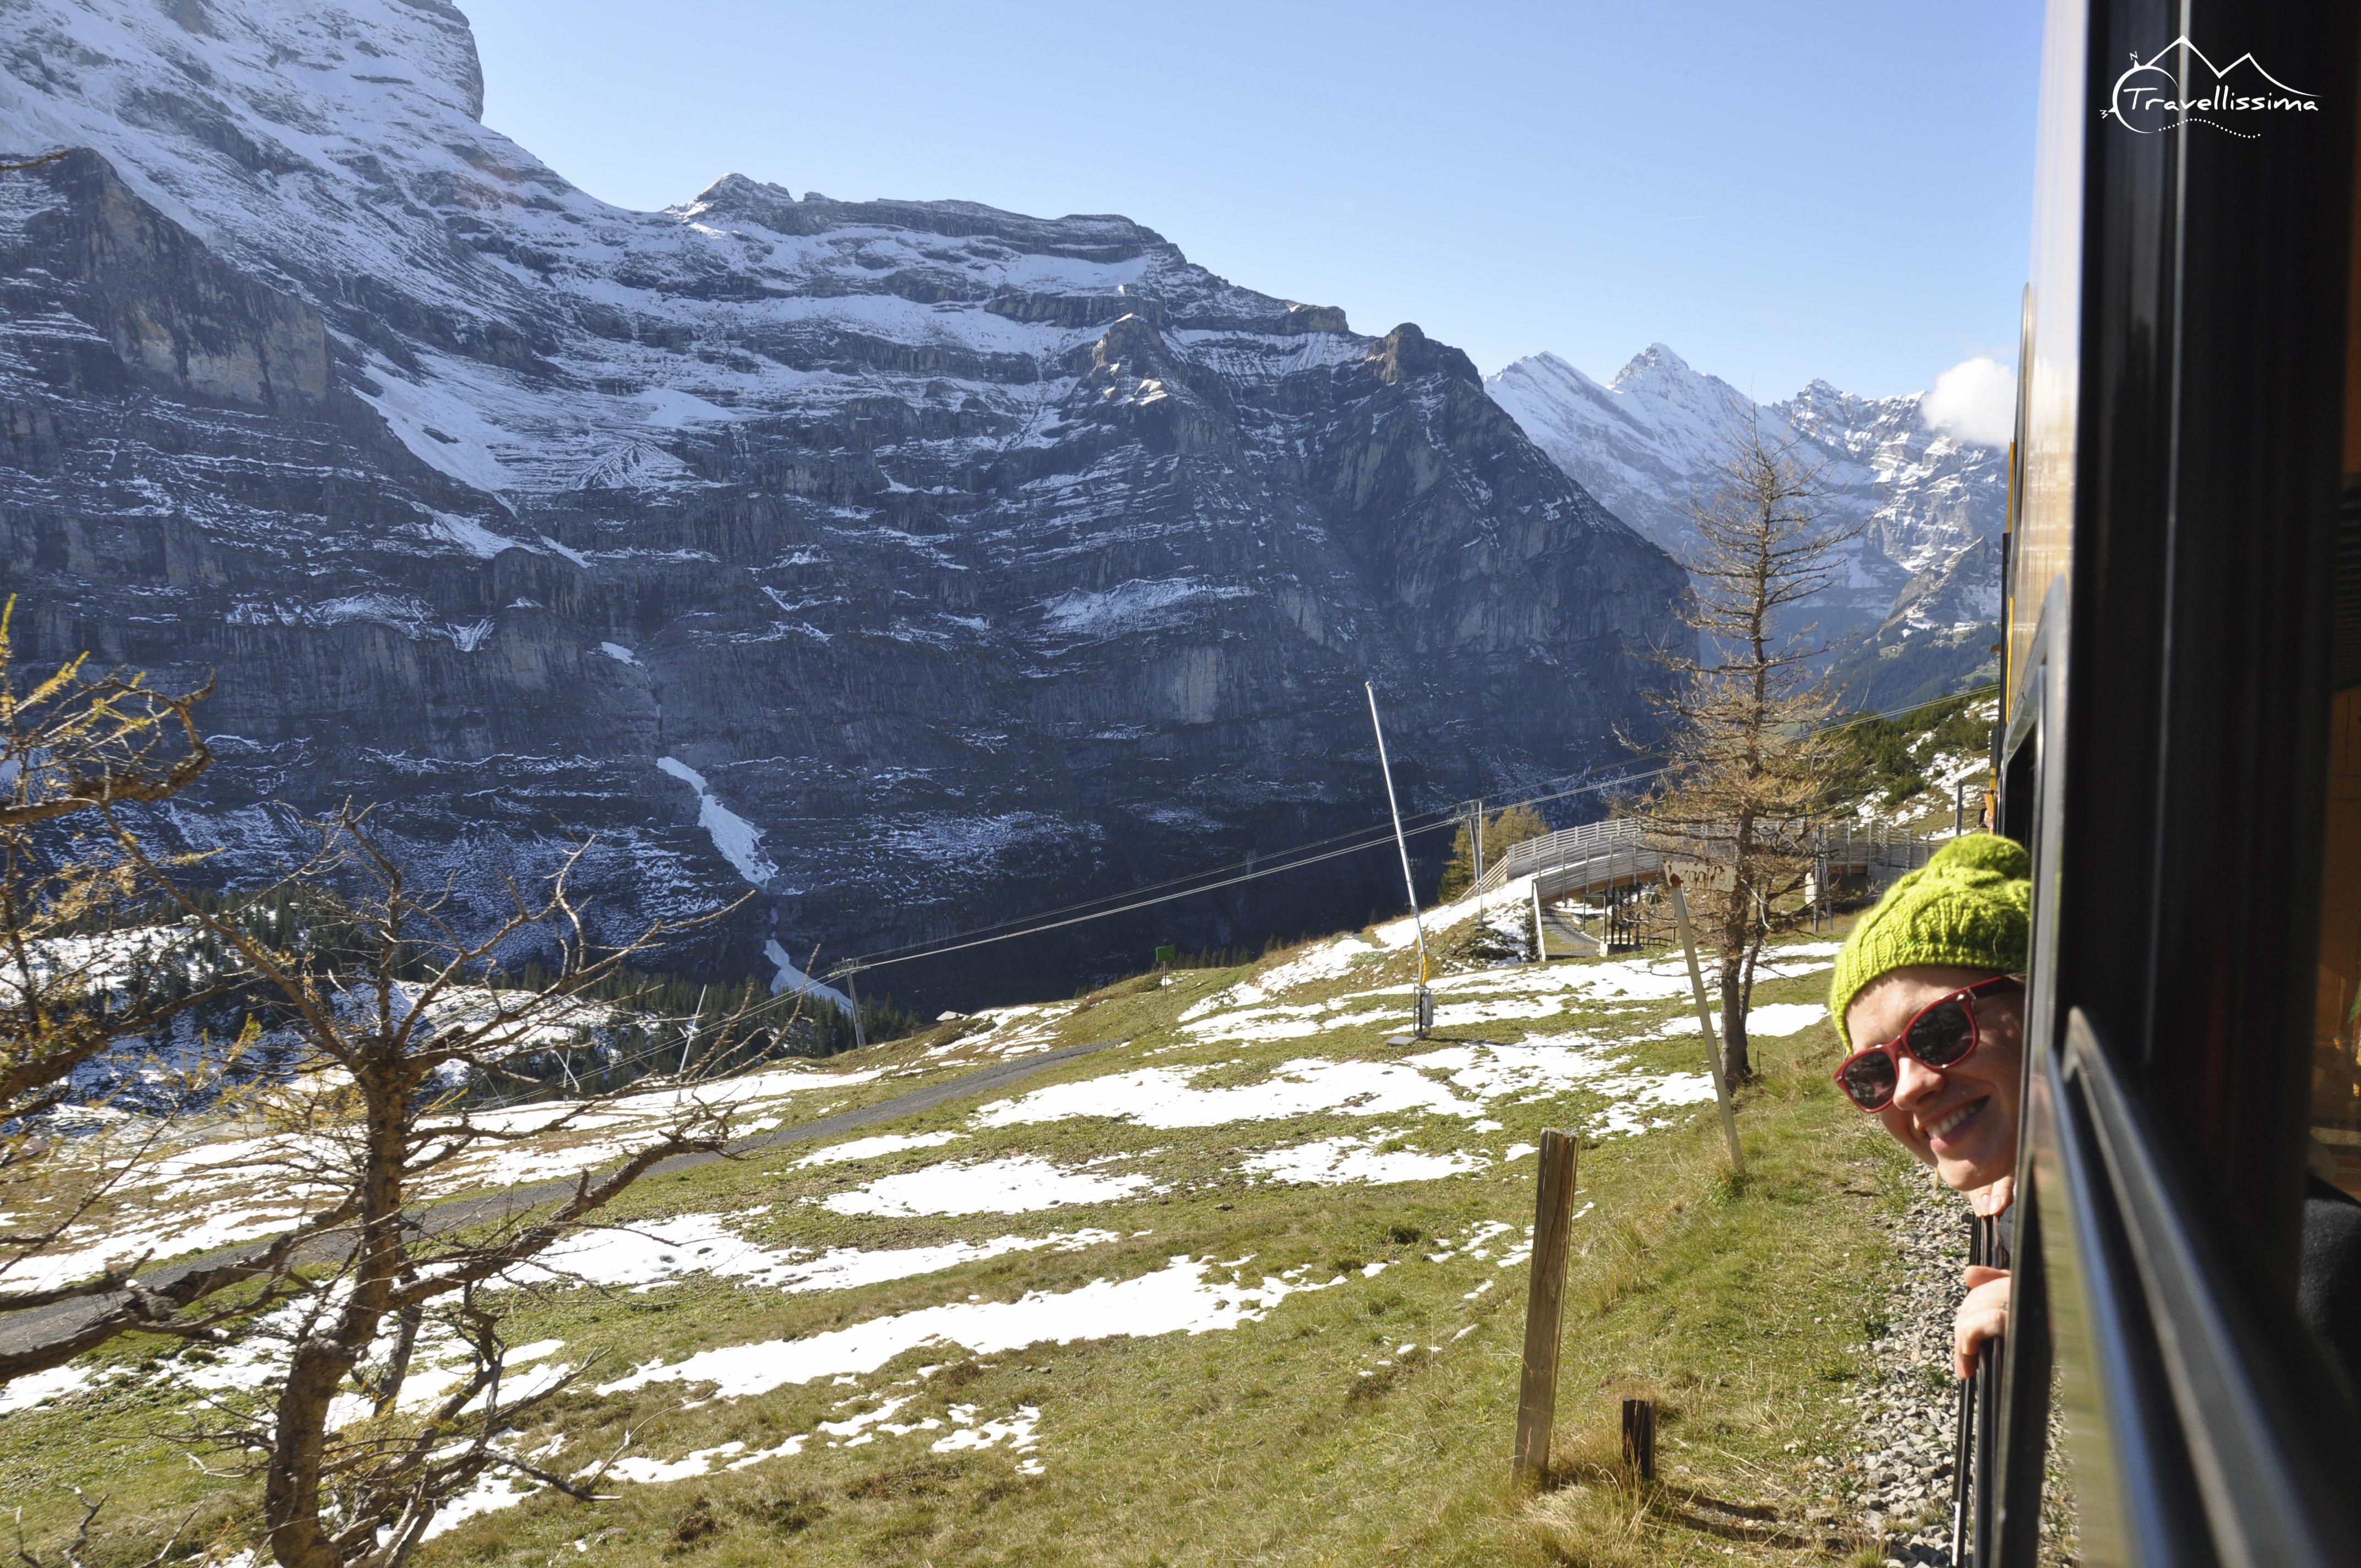 jungfraujoch_TopofEurope_Switzerland_Anna_Kedzierska--2